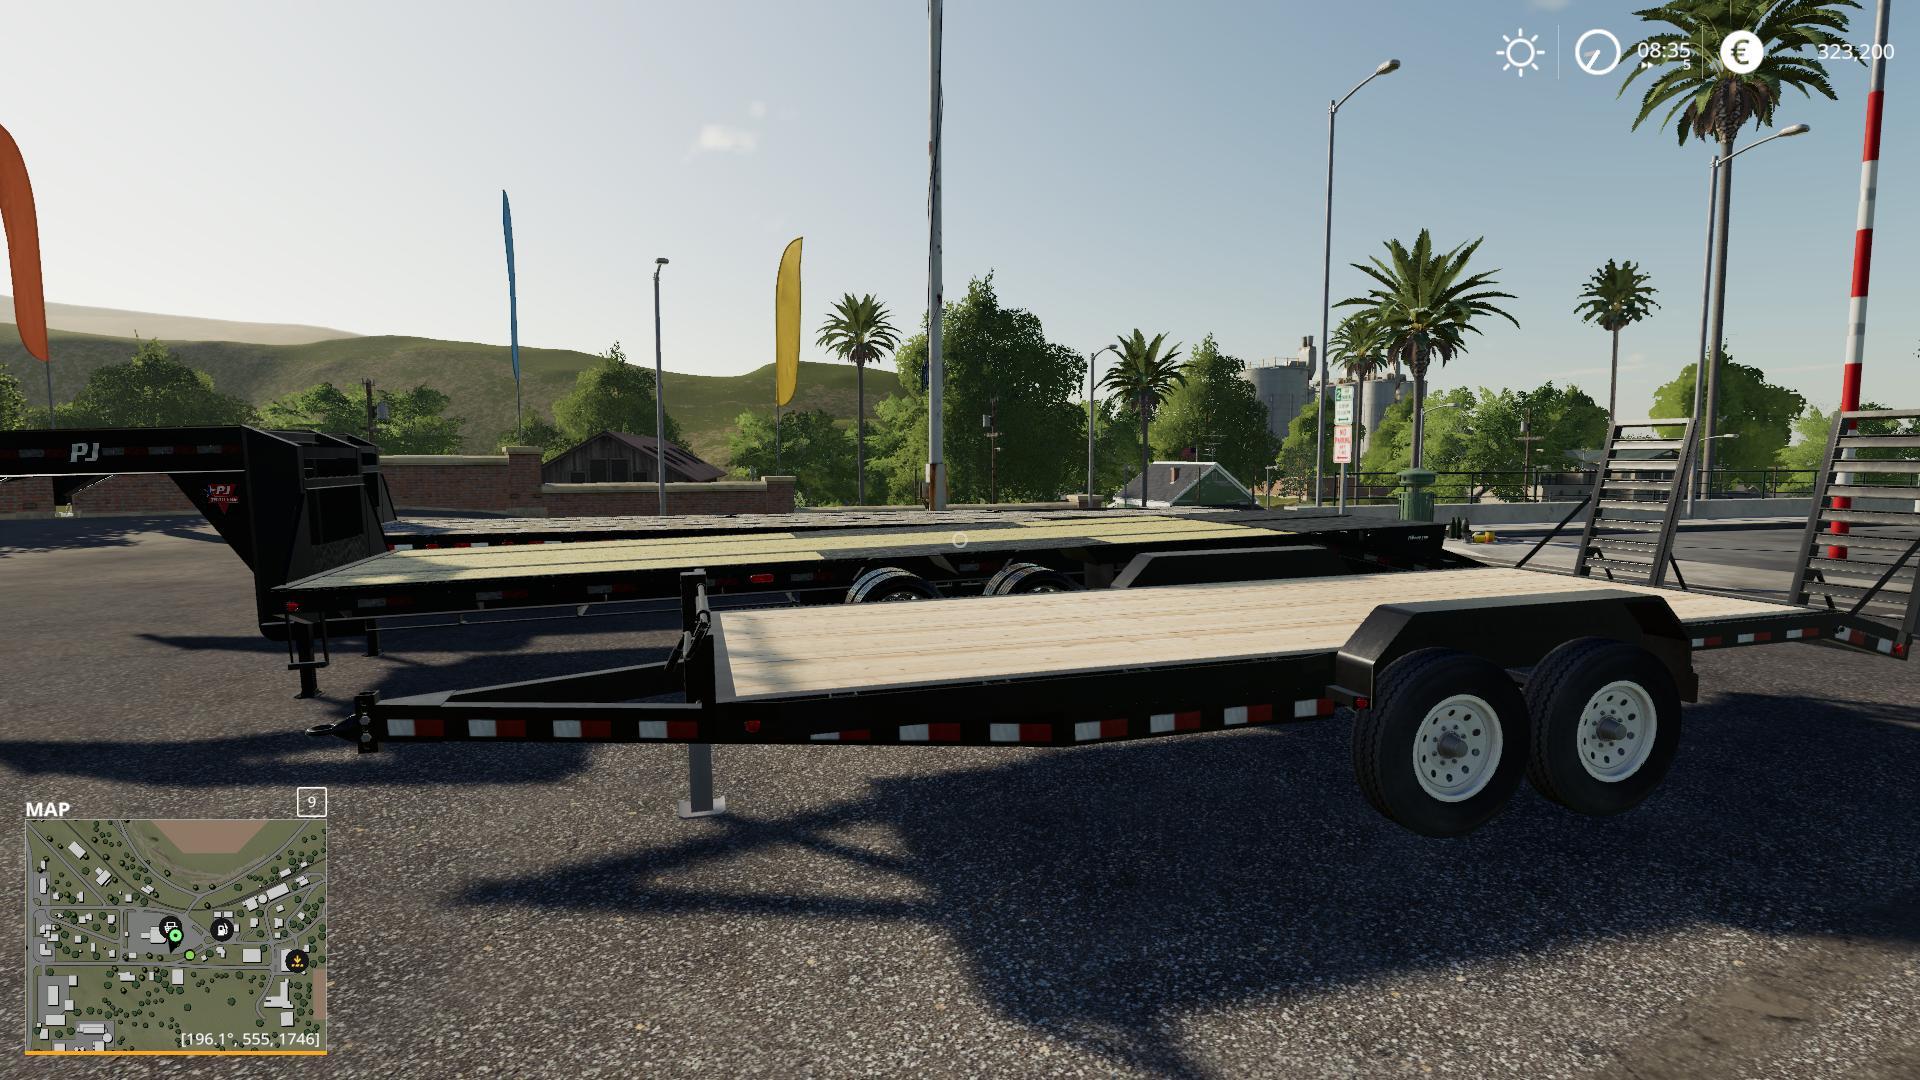 FS 19 3 trailers in 1 mod pack v1 0 - Farming Simulator 19 mod, LS19